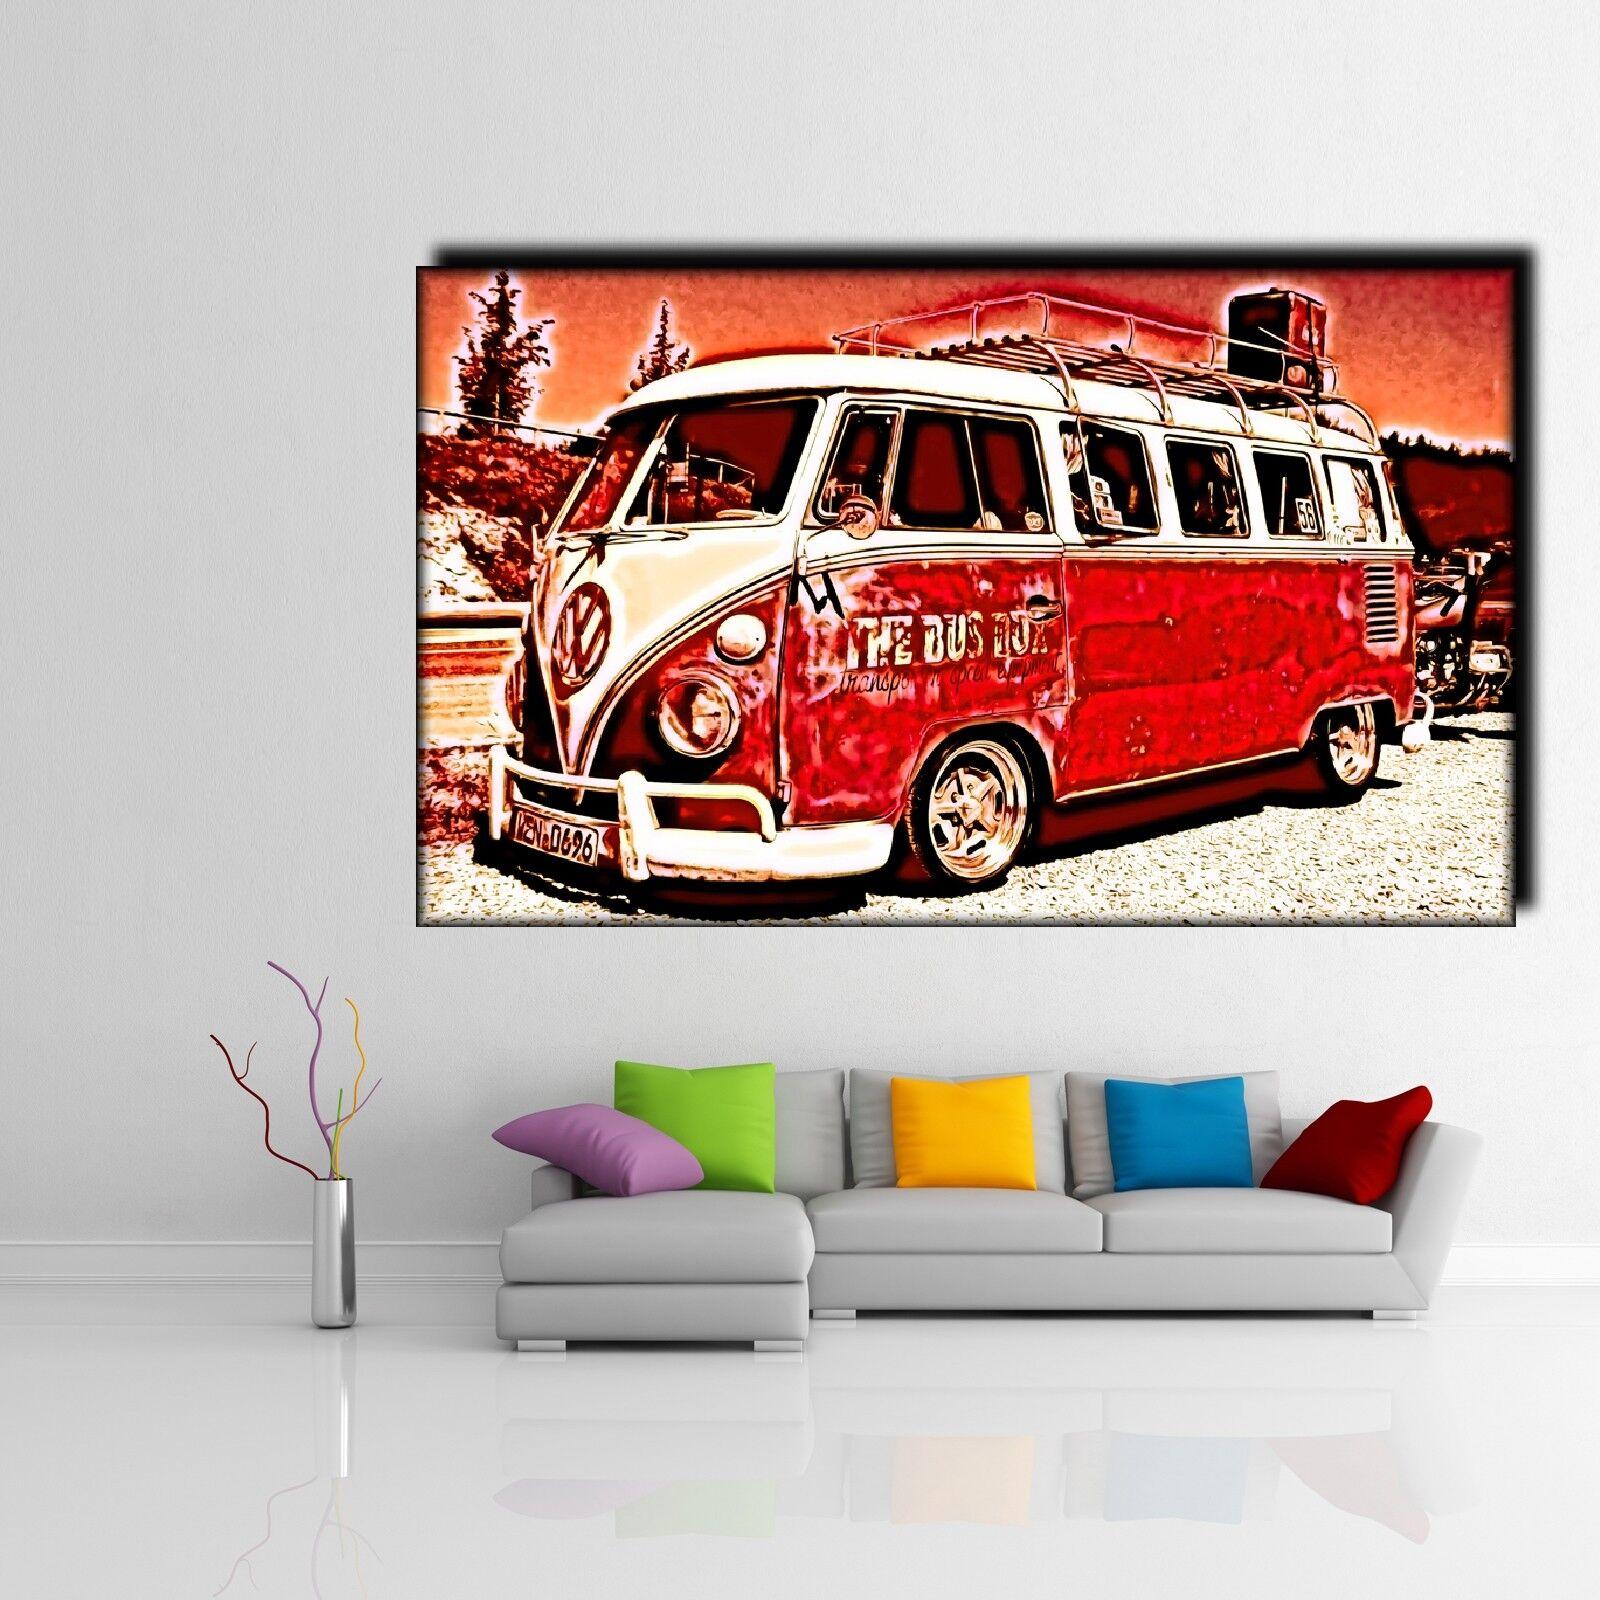 LEINWAND BILD ER XXL POP ART VW BULLI BUS BULLY T1 VAN ABSTRAKT POSTER 150x90